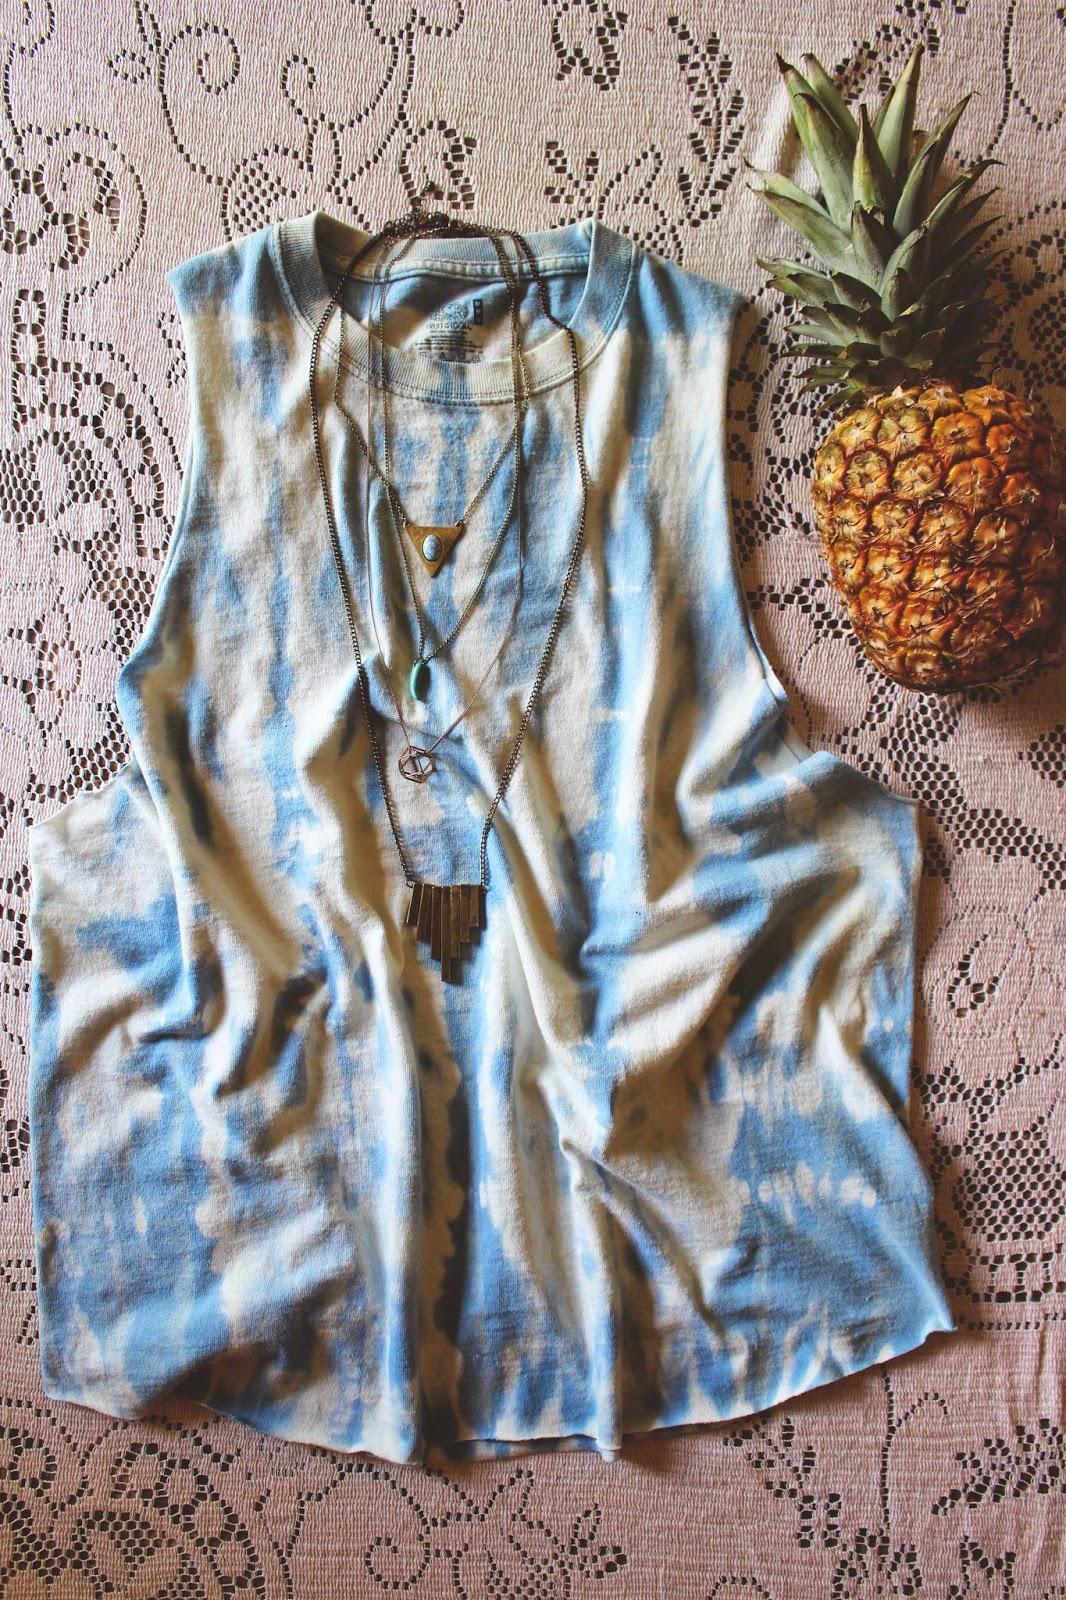 Diy Tie Dye Patterns Interesting Design Inspiration